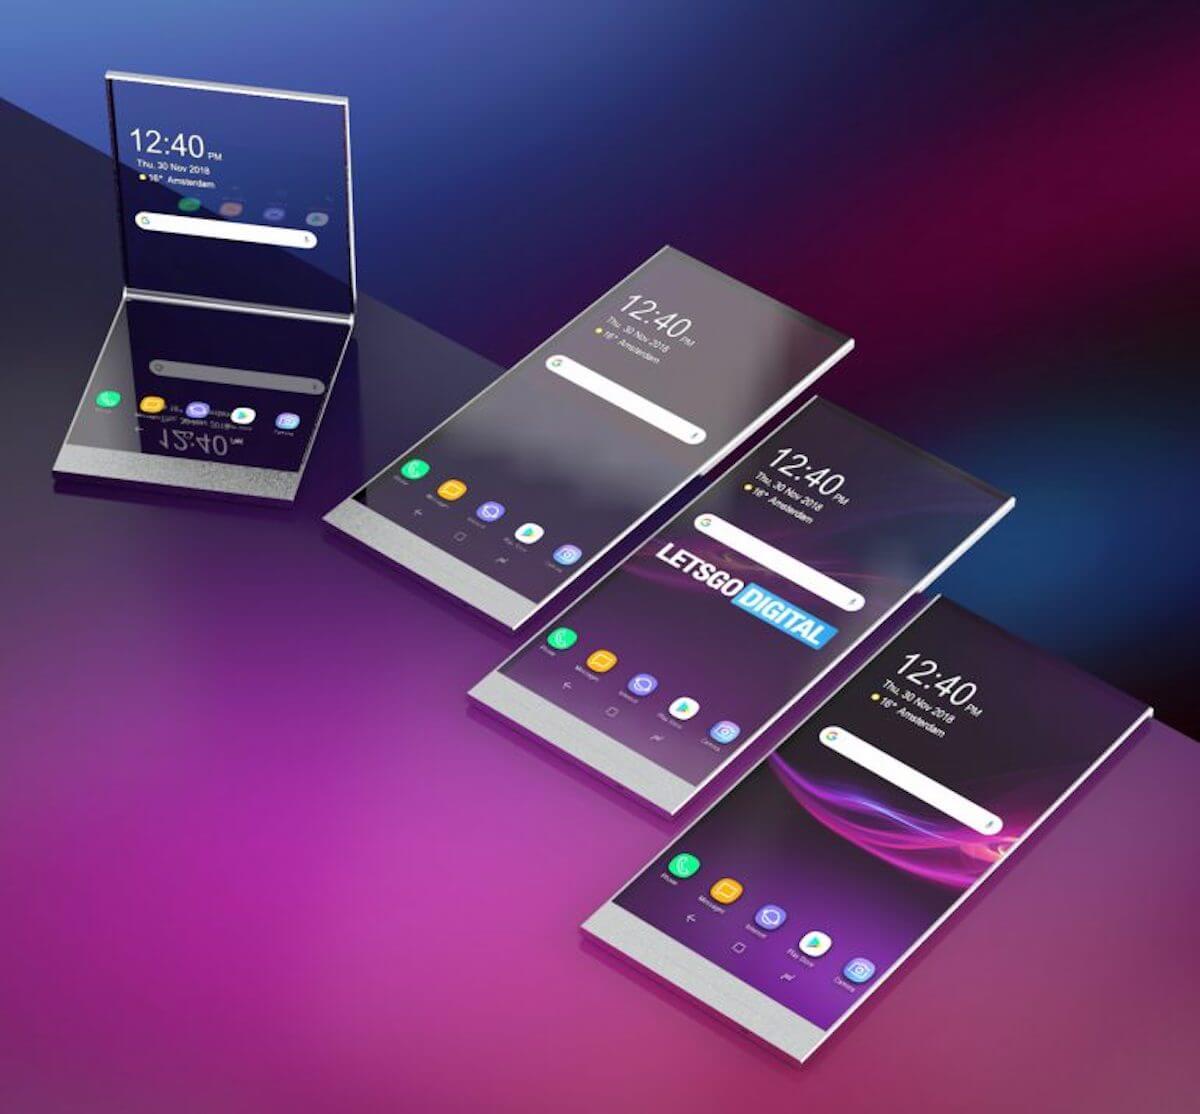 Sonyも「折りたたみXperia」発売か?2020年発表を示唆|レンダリング画像も公開 tech190531_sony_foldable_1